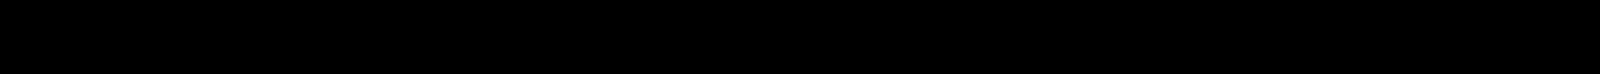 lfdmcb